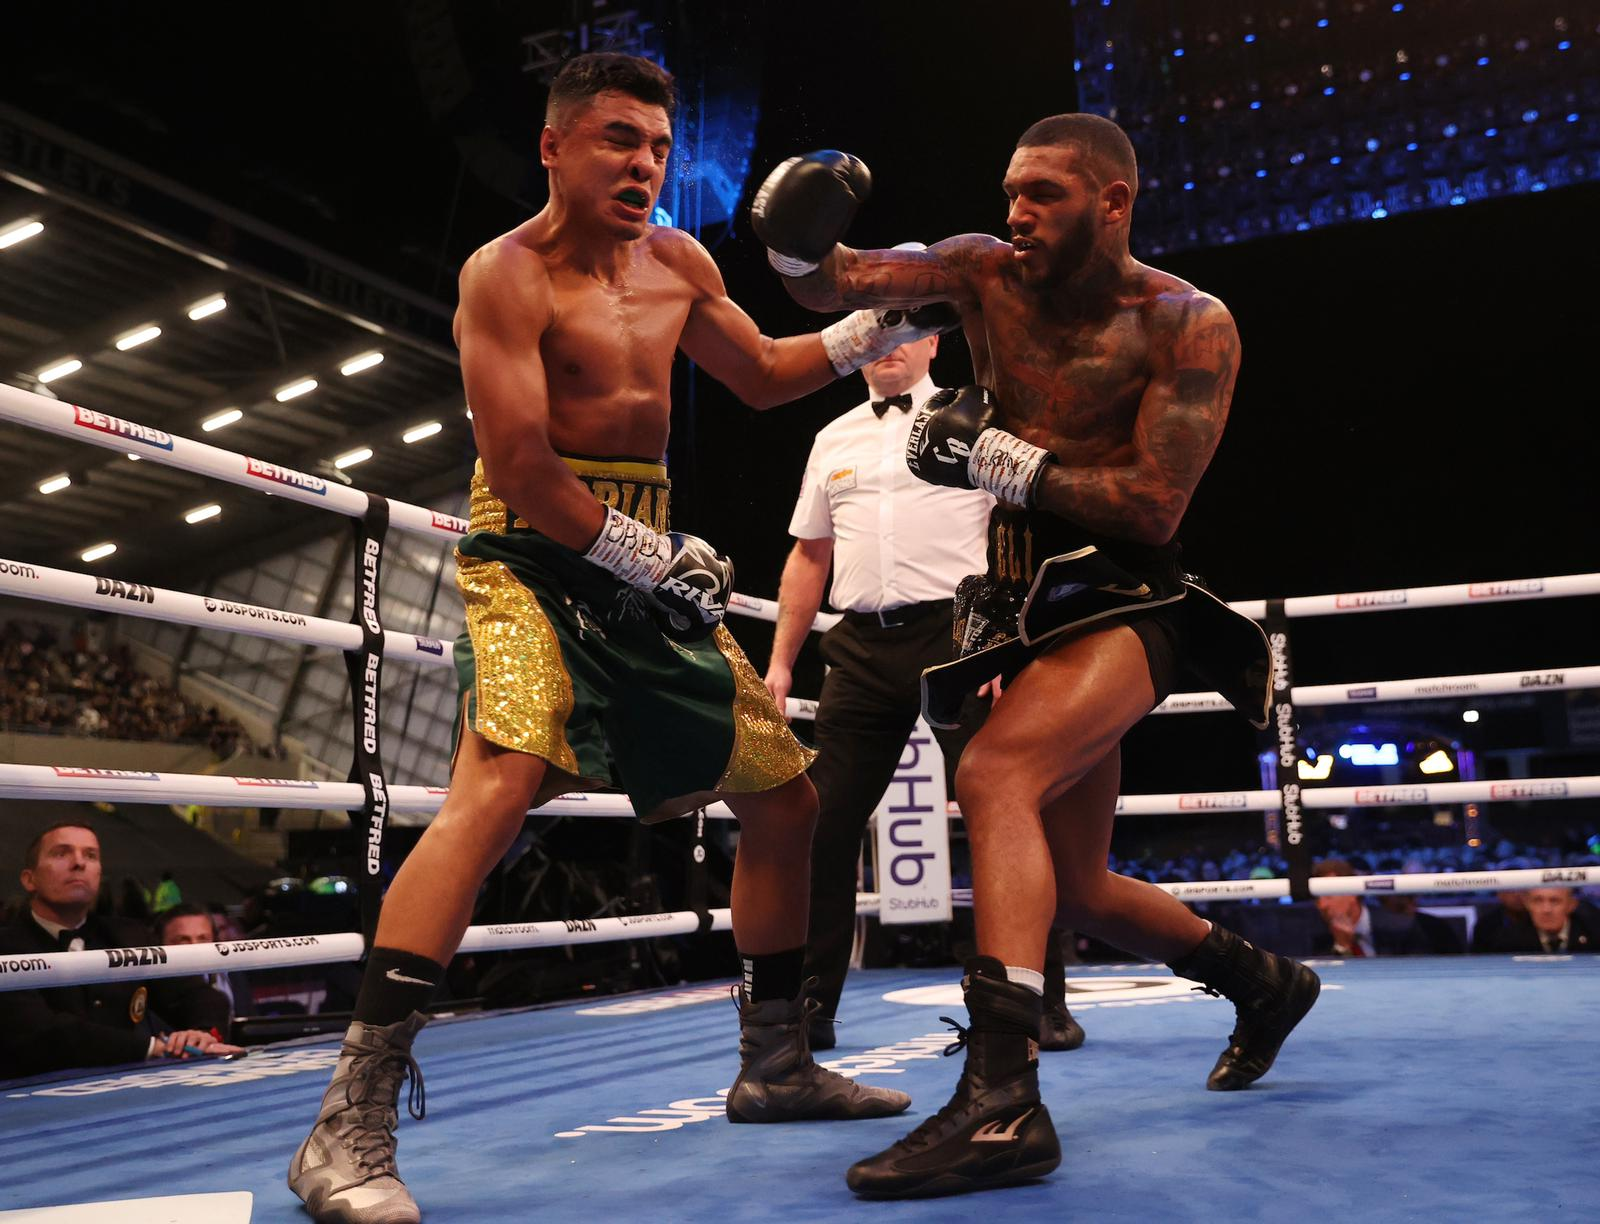 Benn defended his WBA-Continental belt against Granados